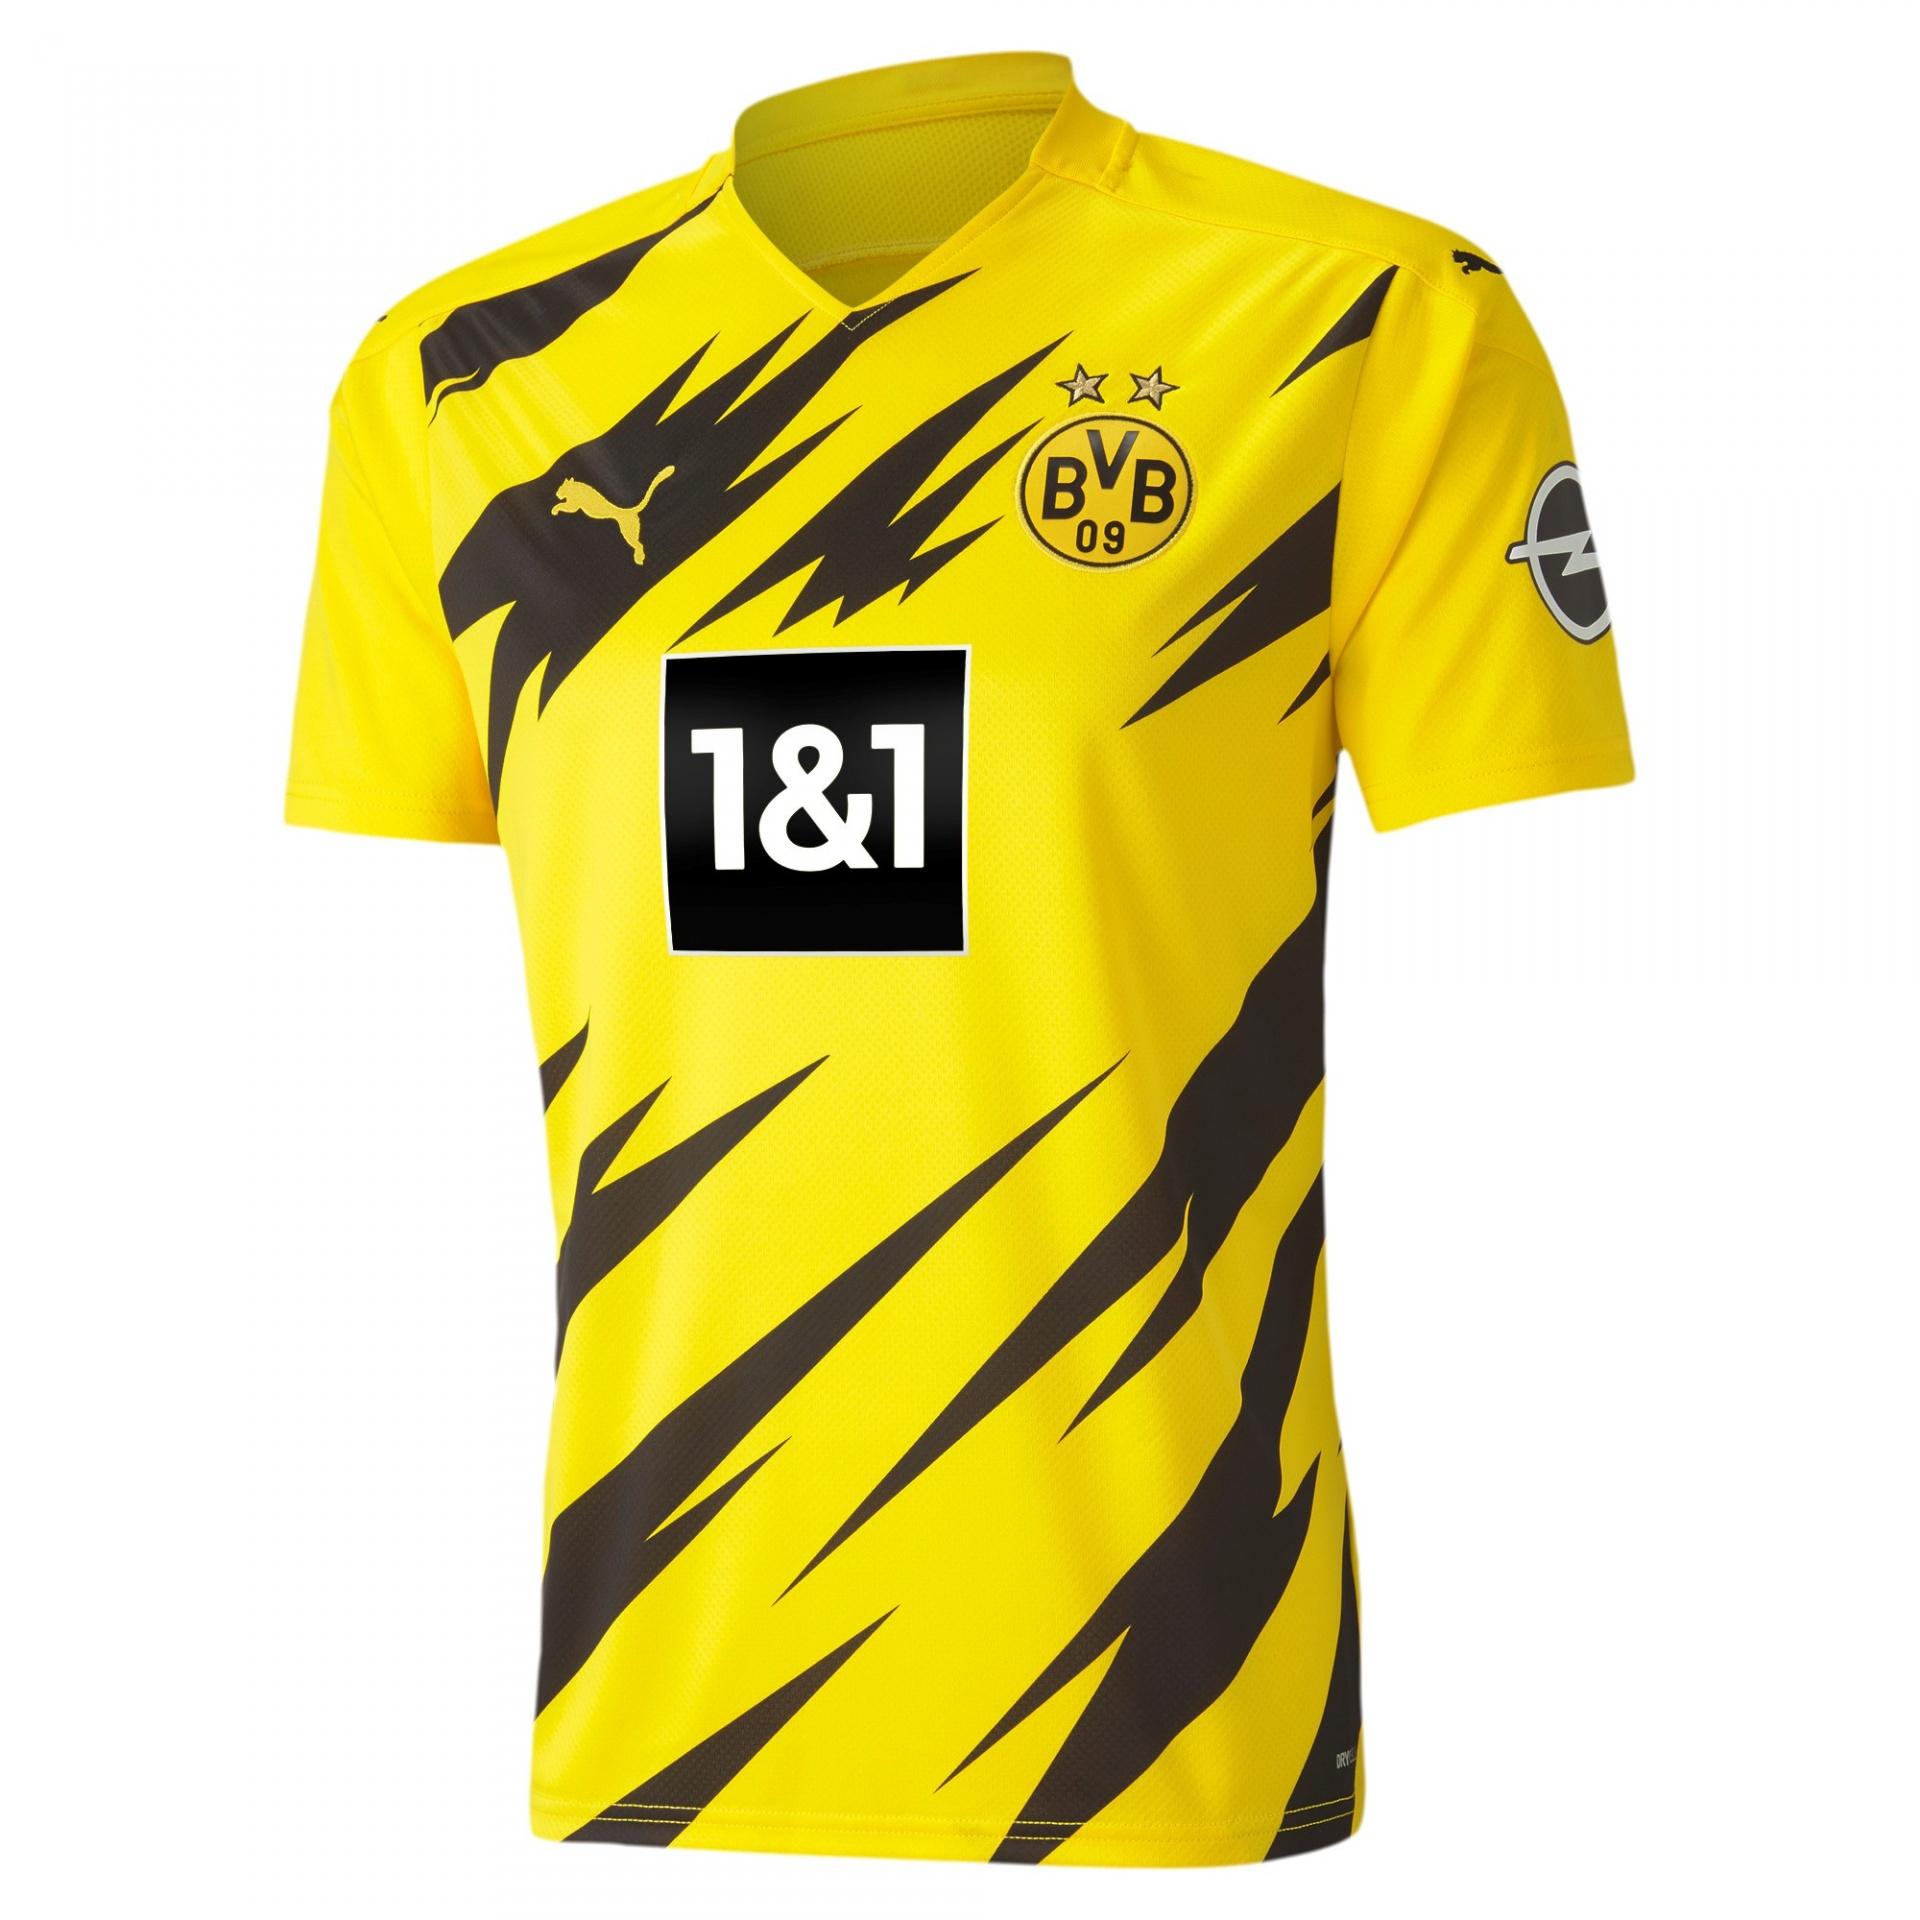 Camisola Principal 20/21Borussia Dortmund